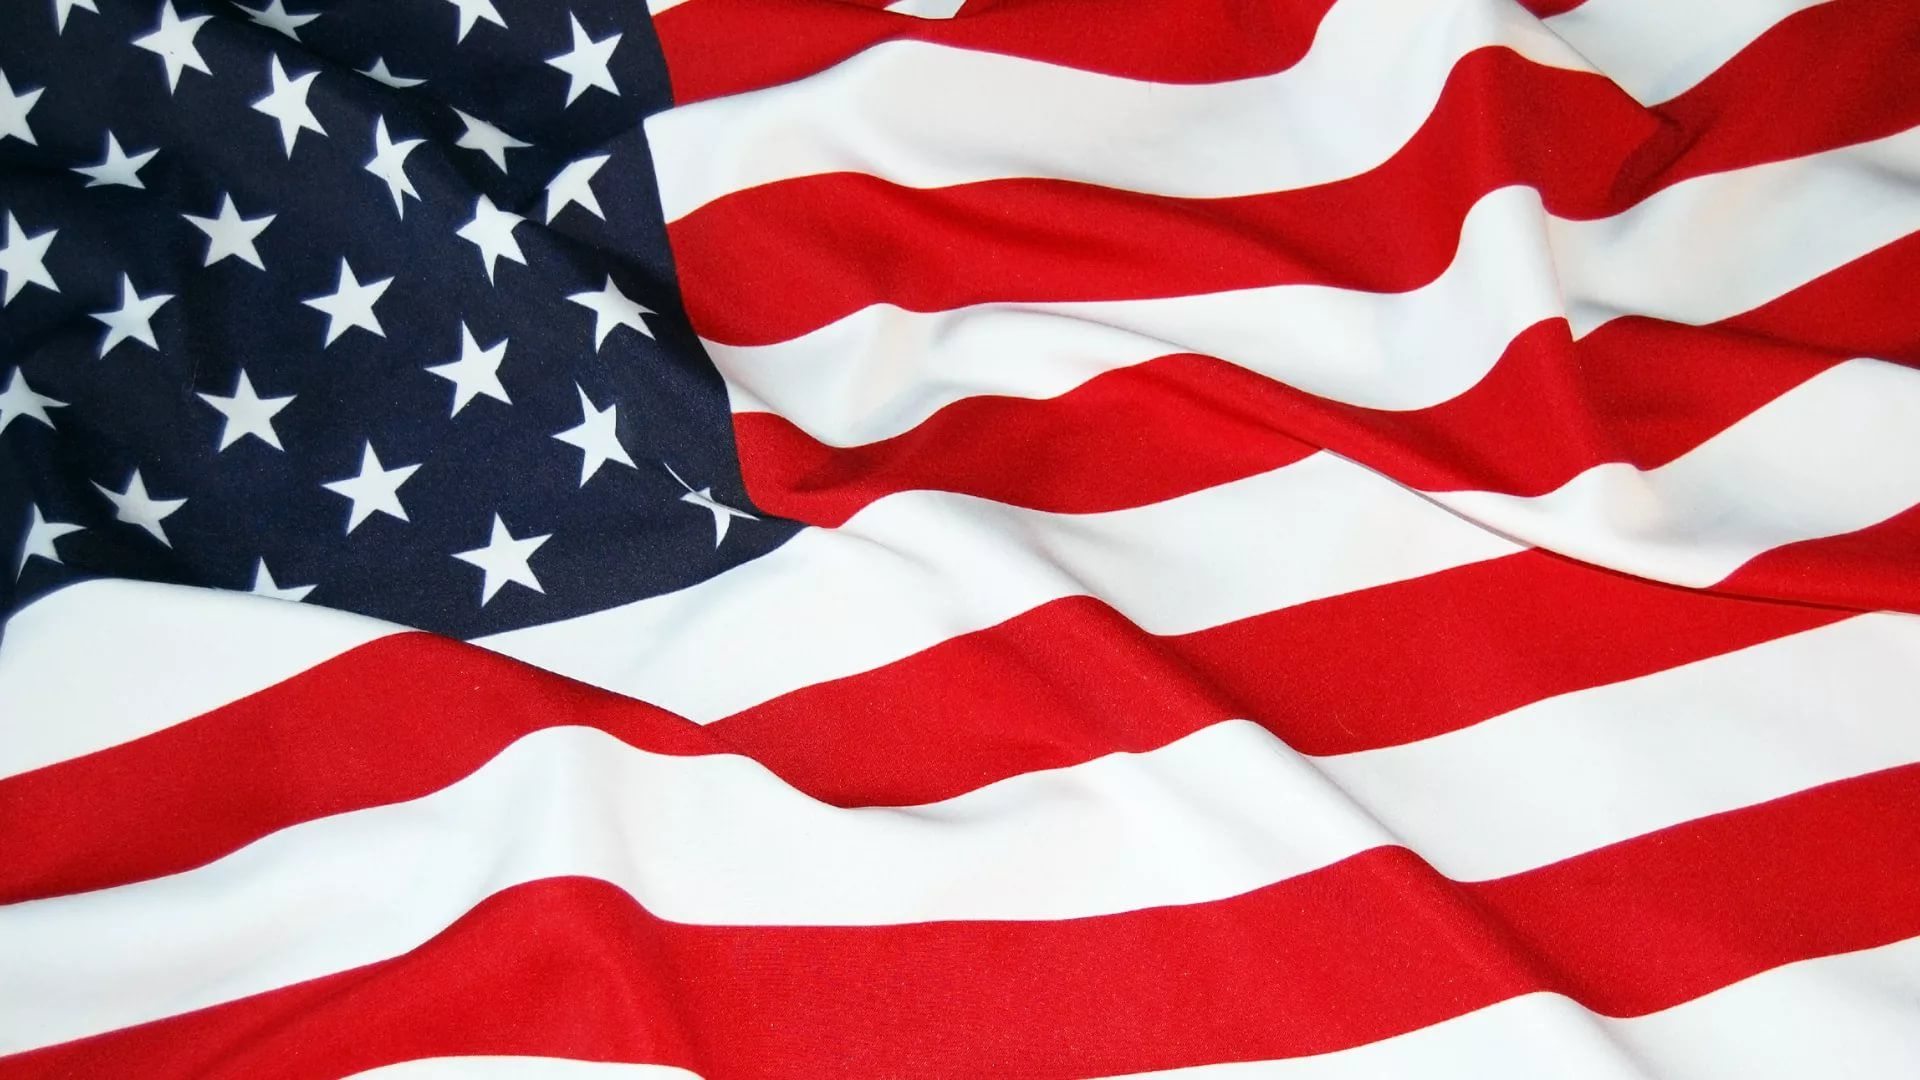 America Flag HD Wallpaper